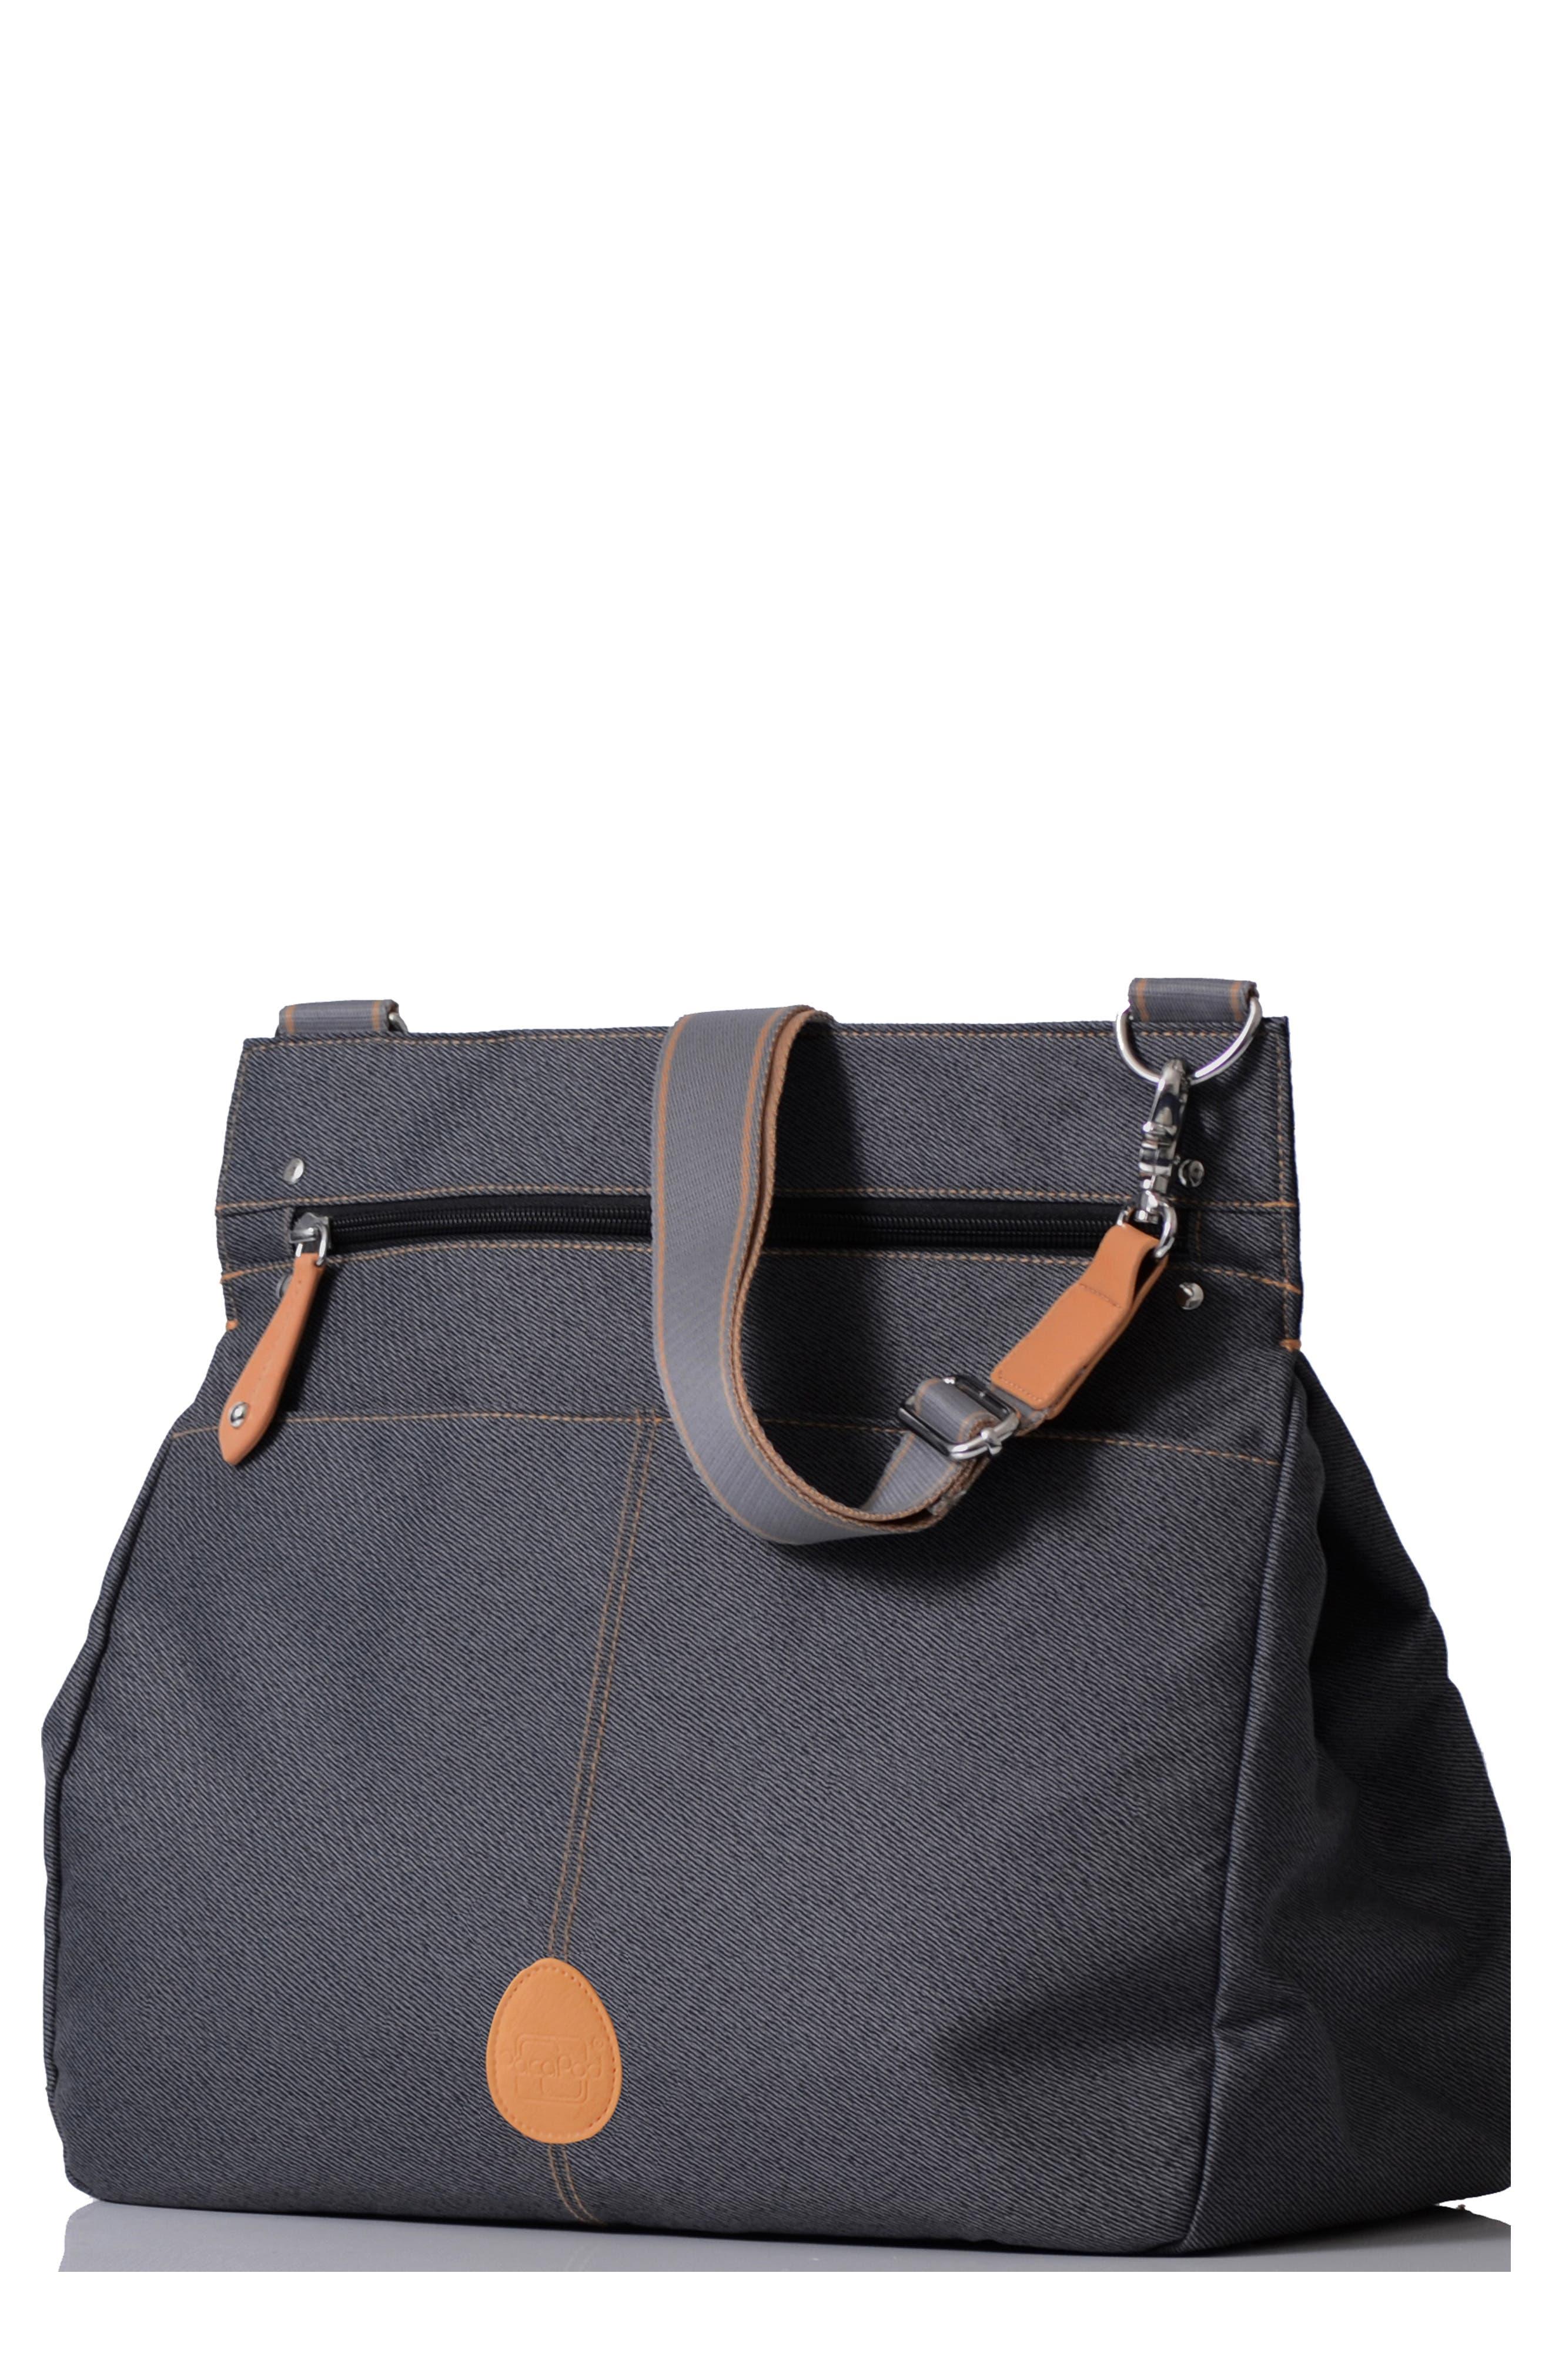 'Oban' Diaper Bag,                             Main thumbnail 1, color,                             BLACK CHARCOAL